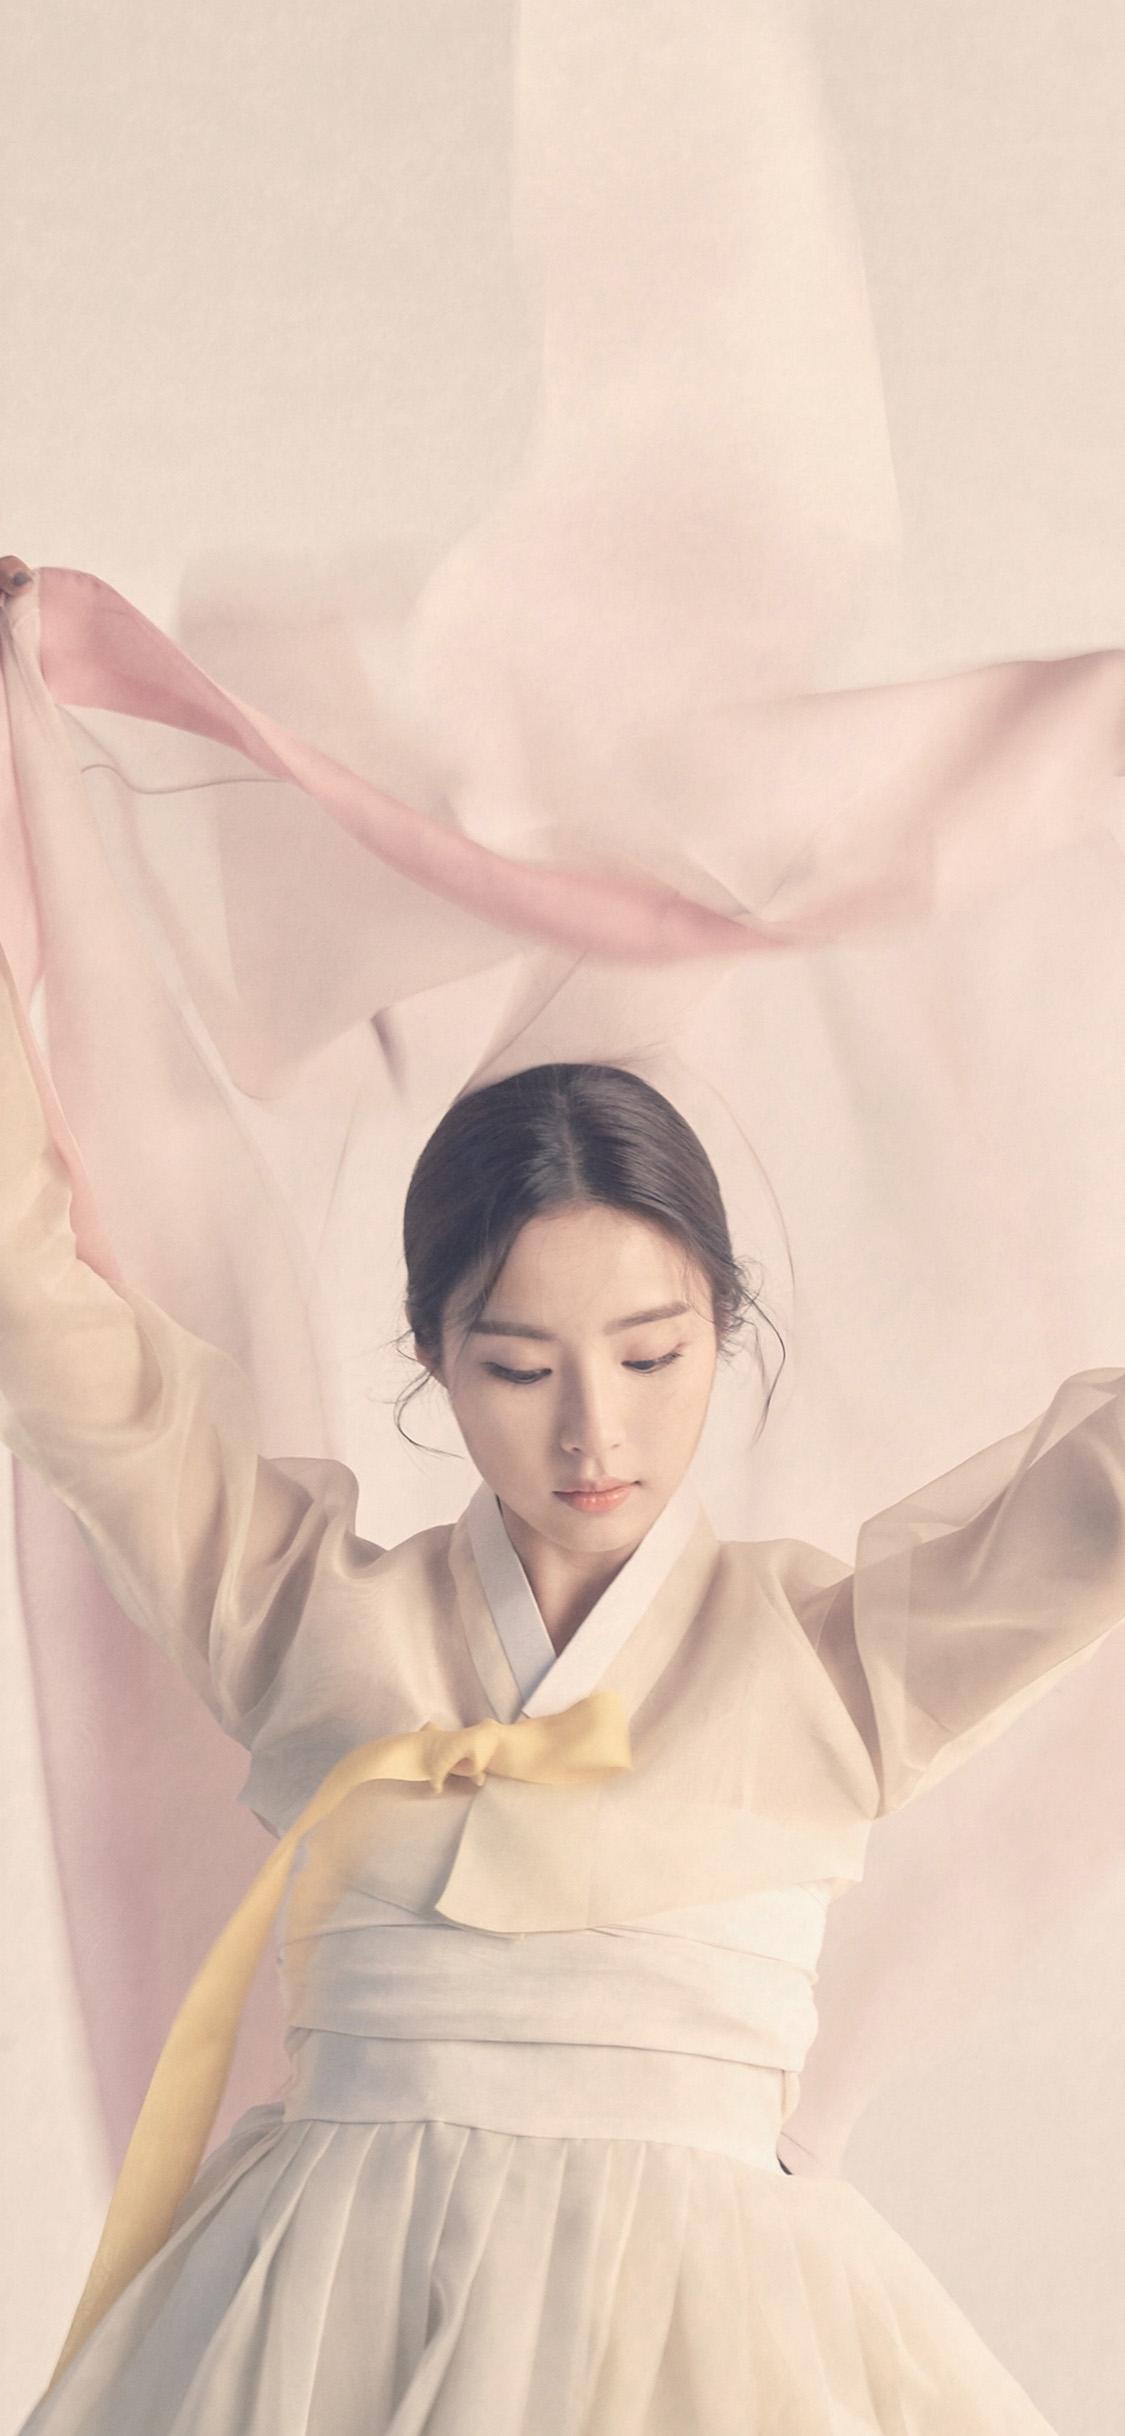 iPhonexpapers.com-Apple-iPhone-wallpaper-hp65-korean-asian-kpop-girl-dress-pink